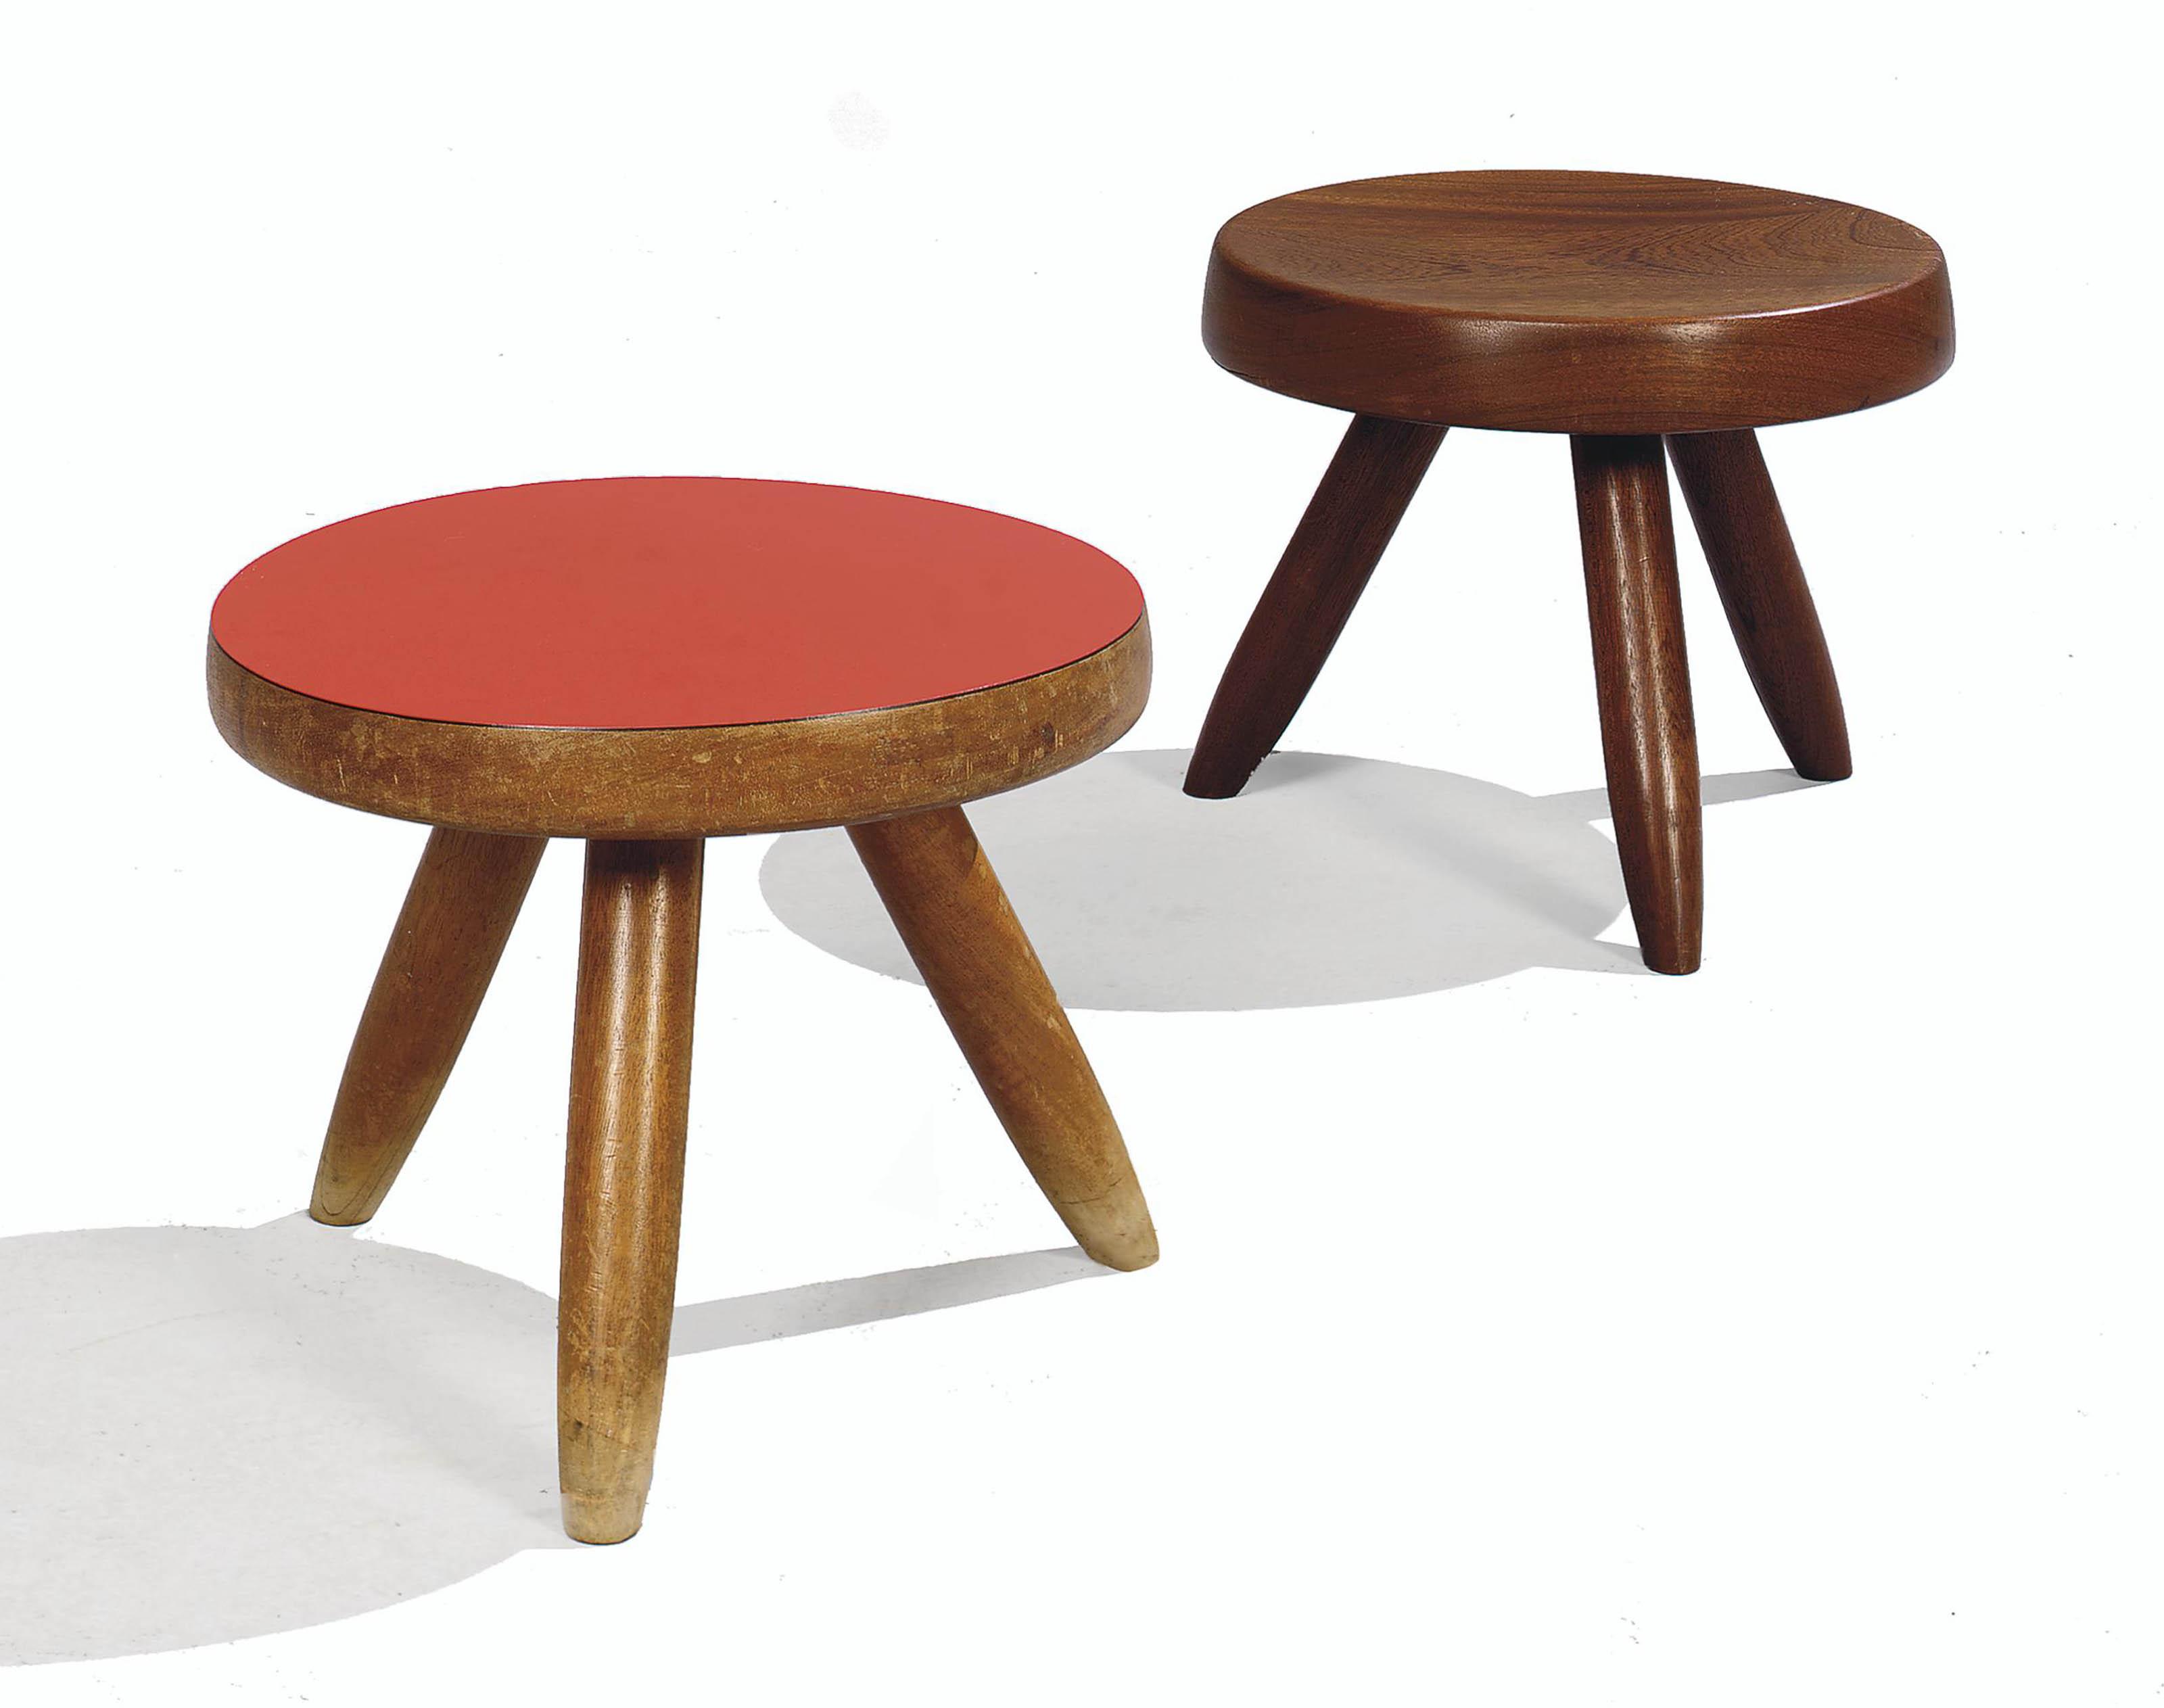 charlotte perriand 1903 1999 deux tabourets tripodes vers 1955 1960 christie 39 s. Black Bedroom Furniture Sets. Home Design Ideas